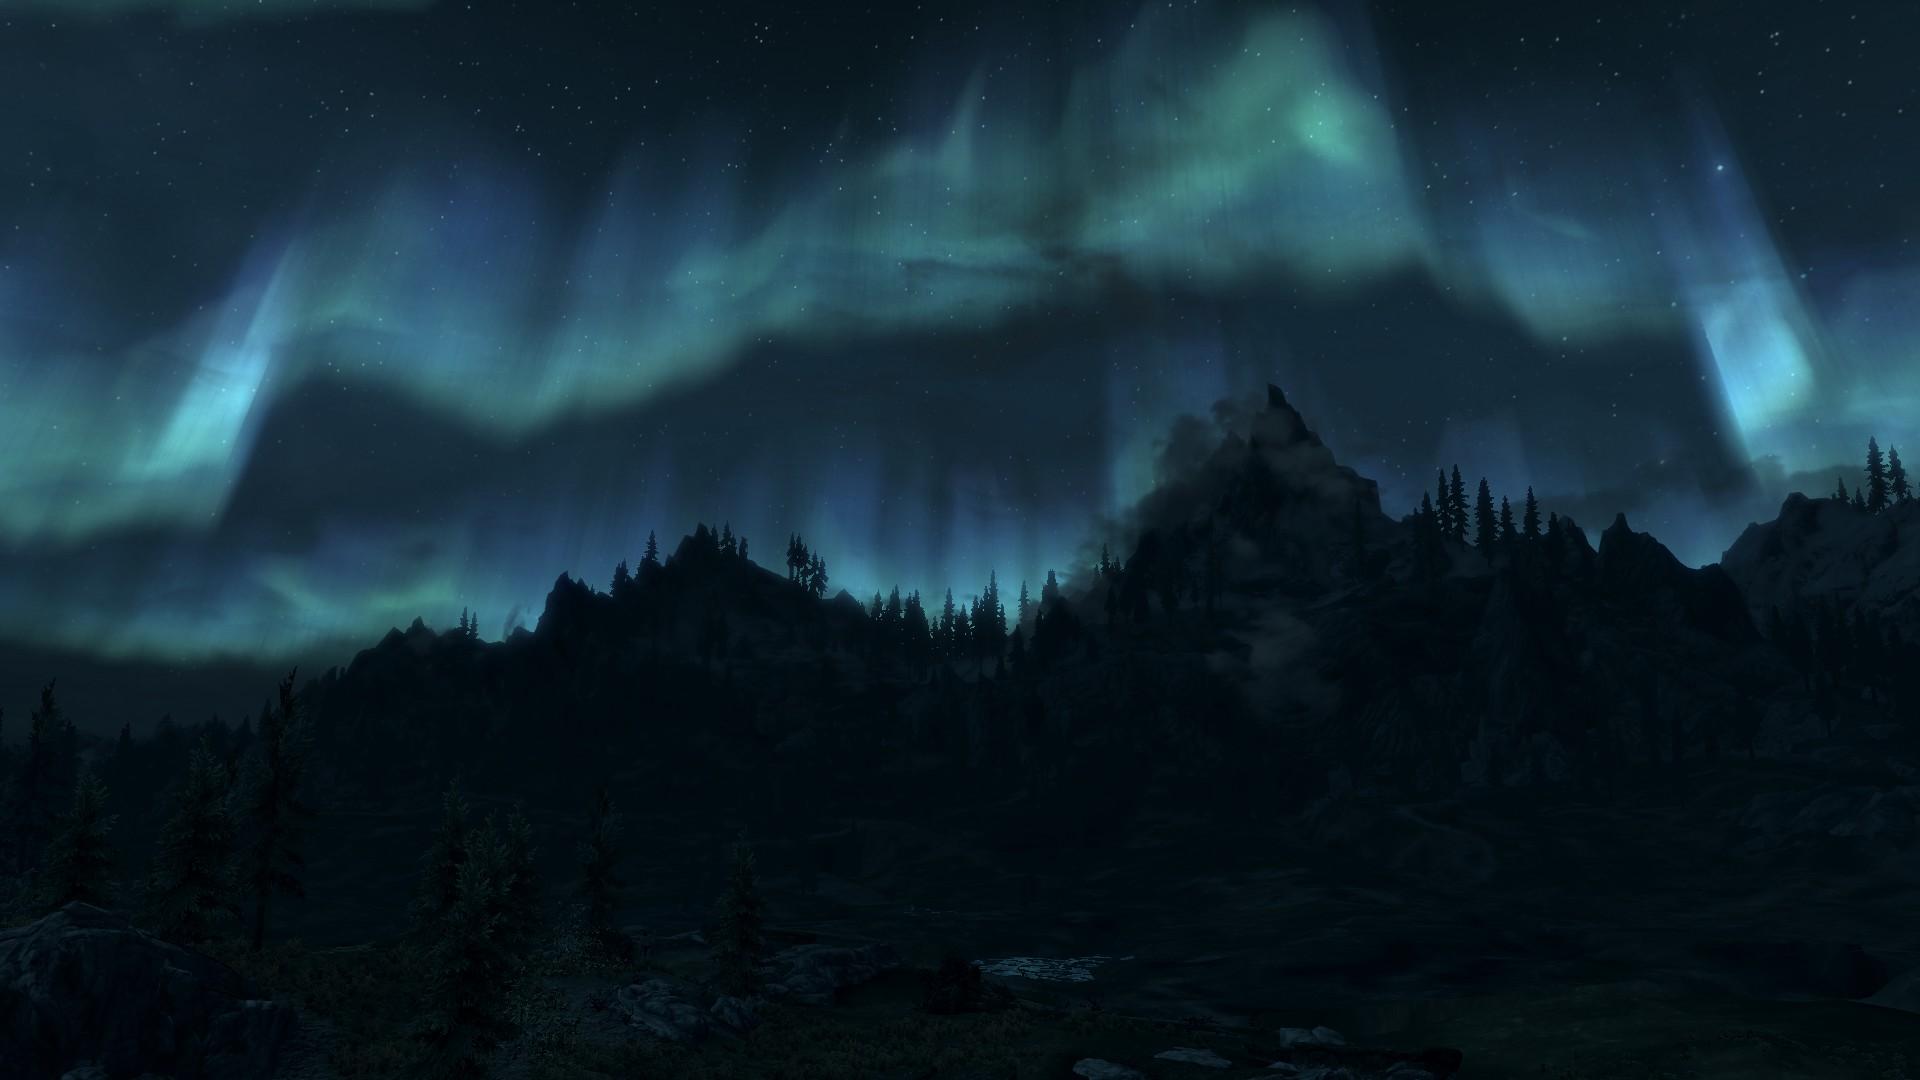 Elder Scrolls V: Skyrim - Wallpaper - 10 by Lonewolf898